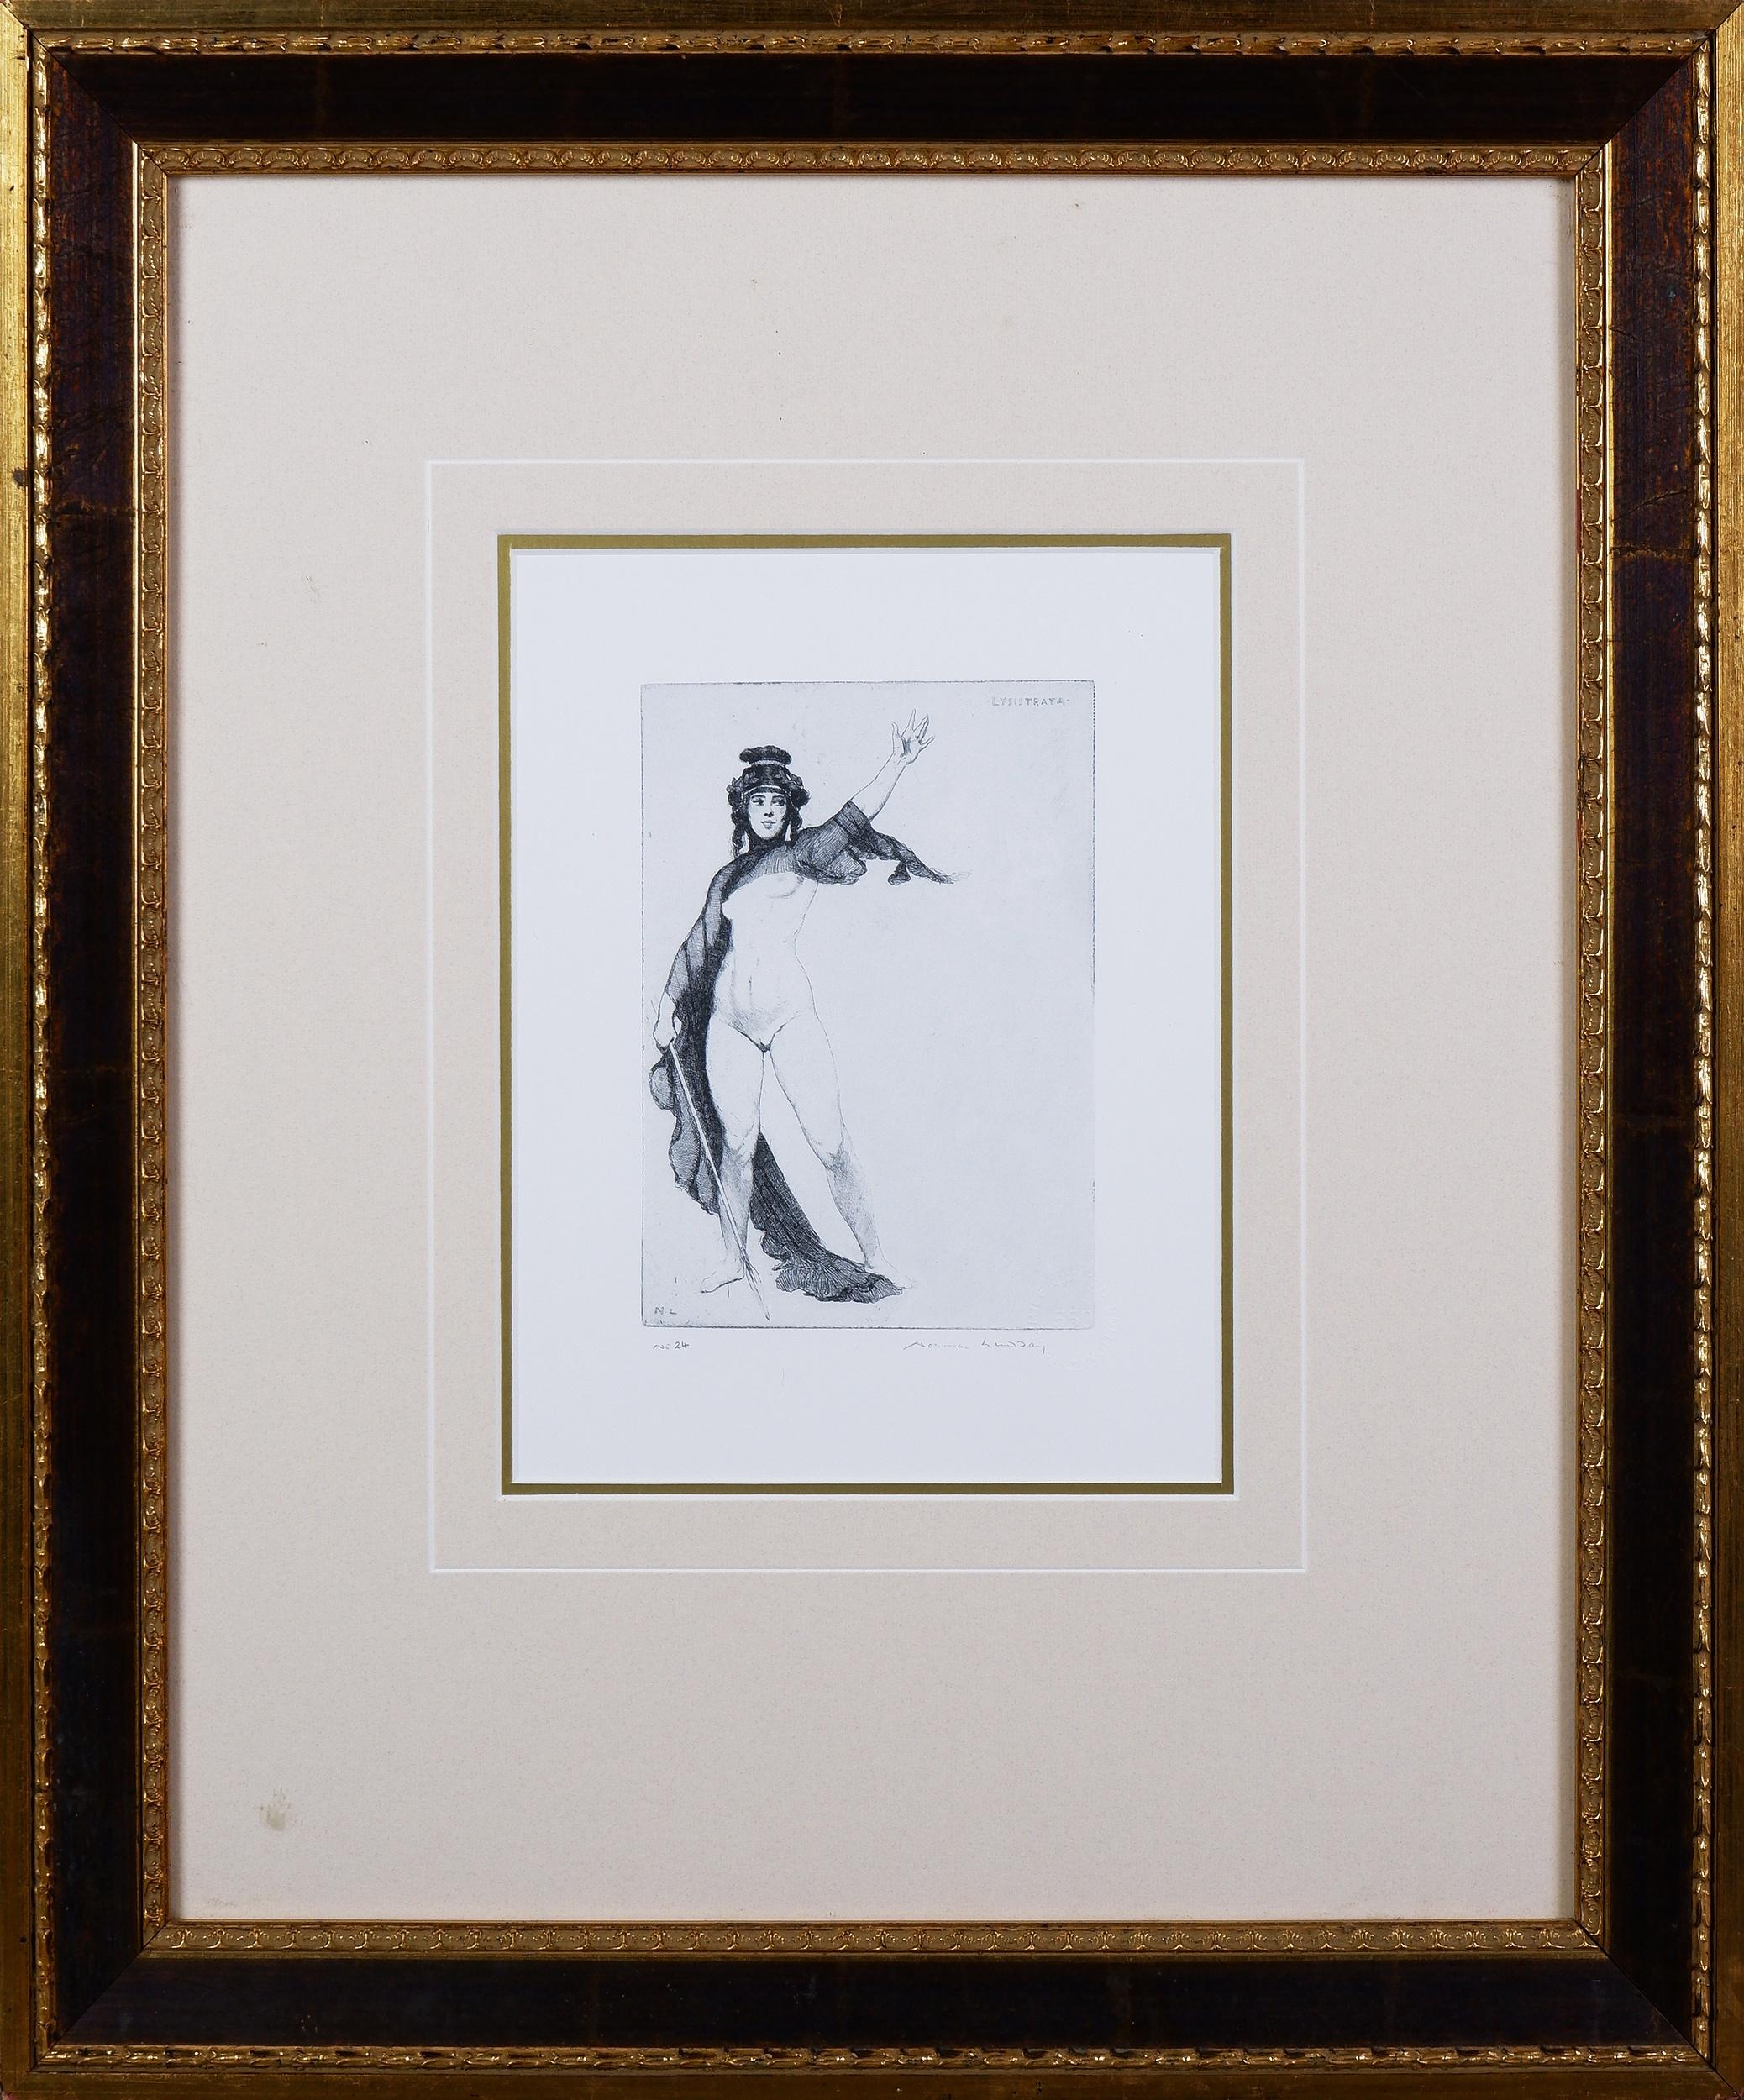 'Norman Lindsay (1879-1969), Lysistrata, Facsimile Etching, 17.5 x 13 cm'